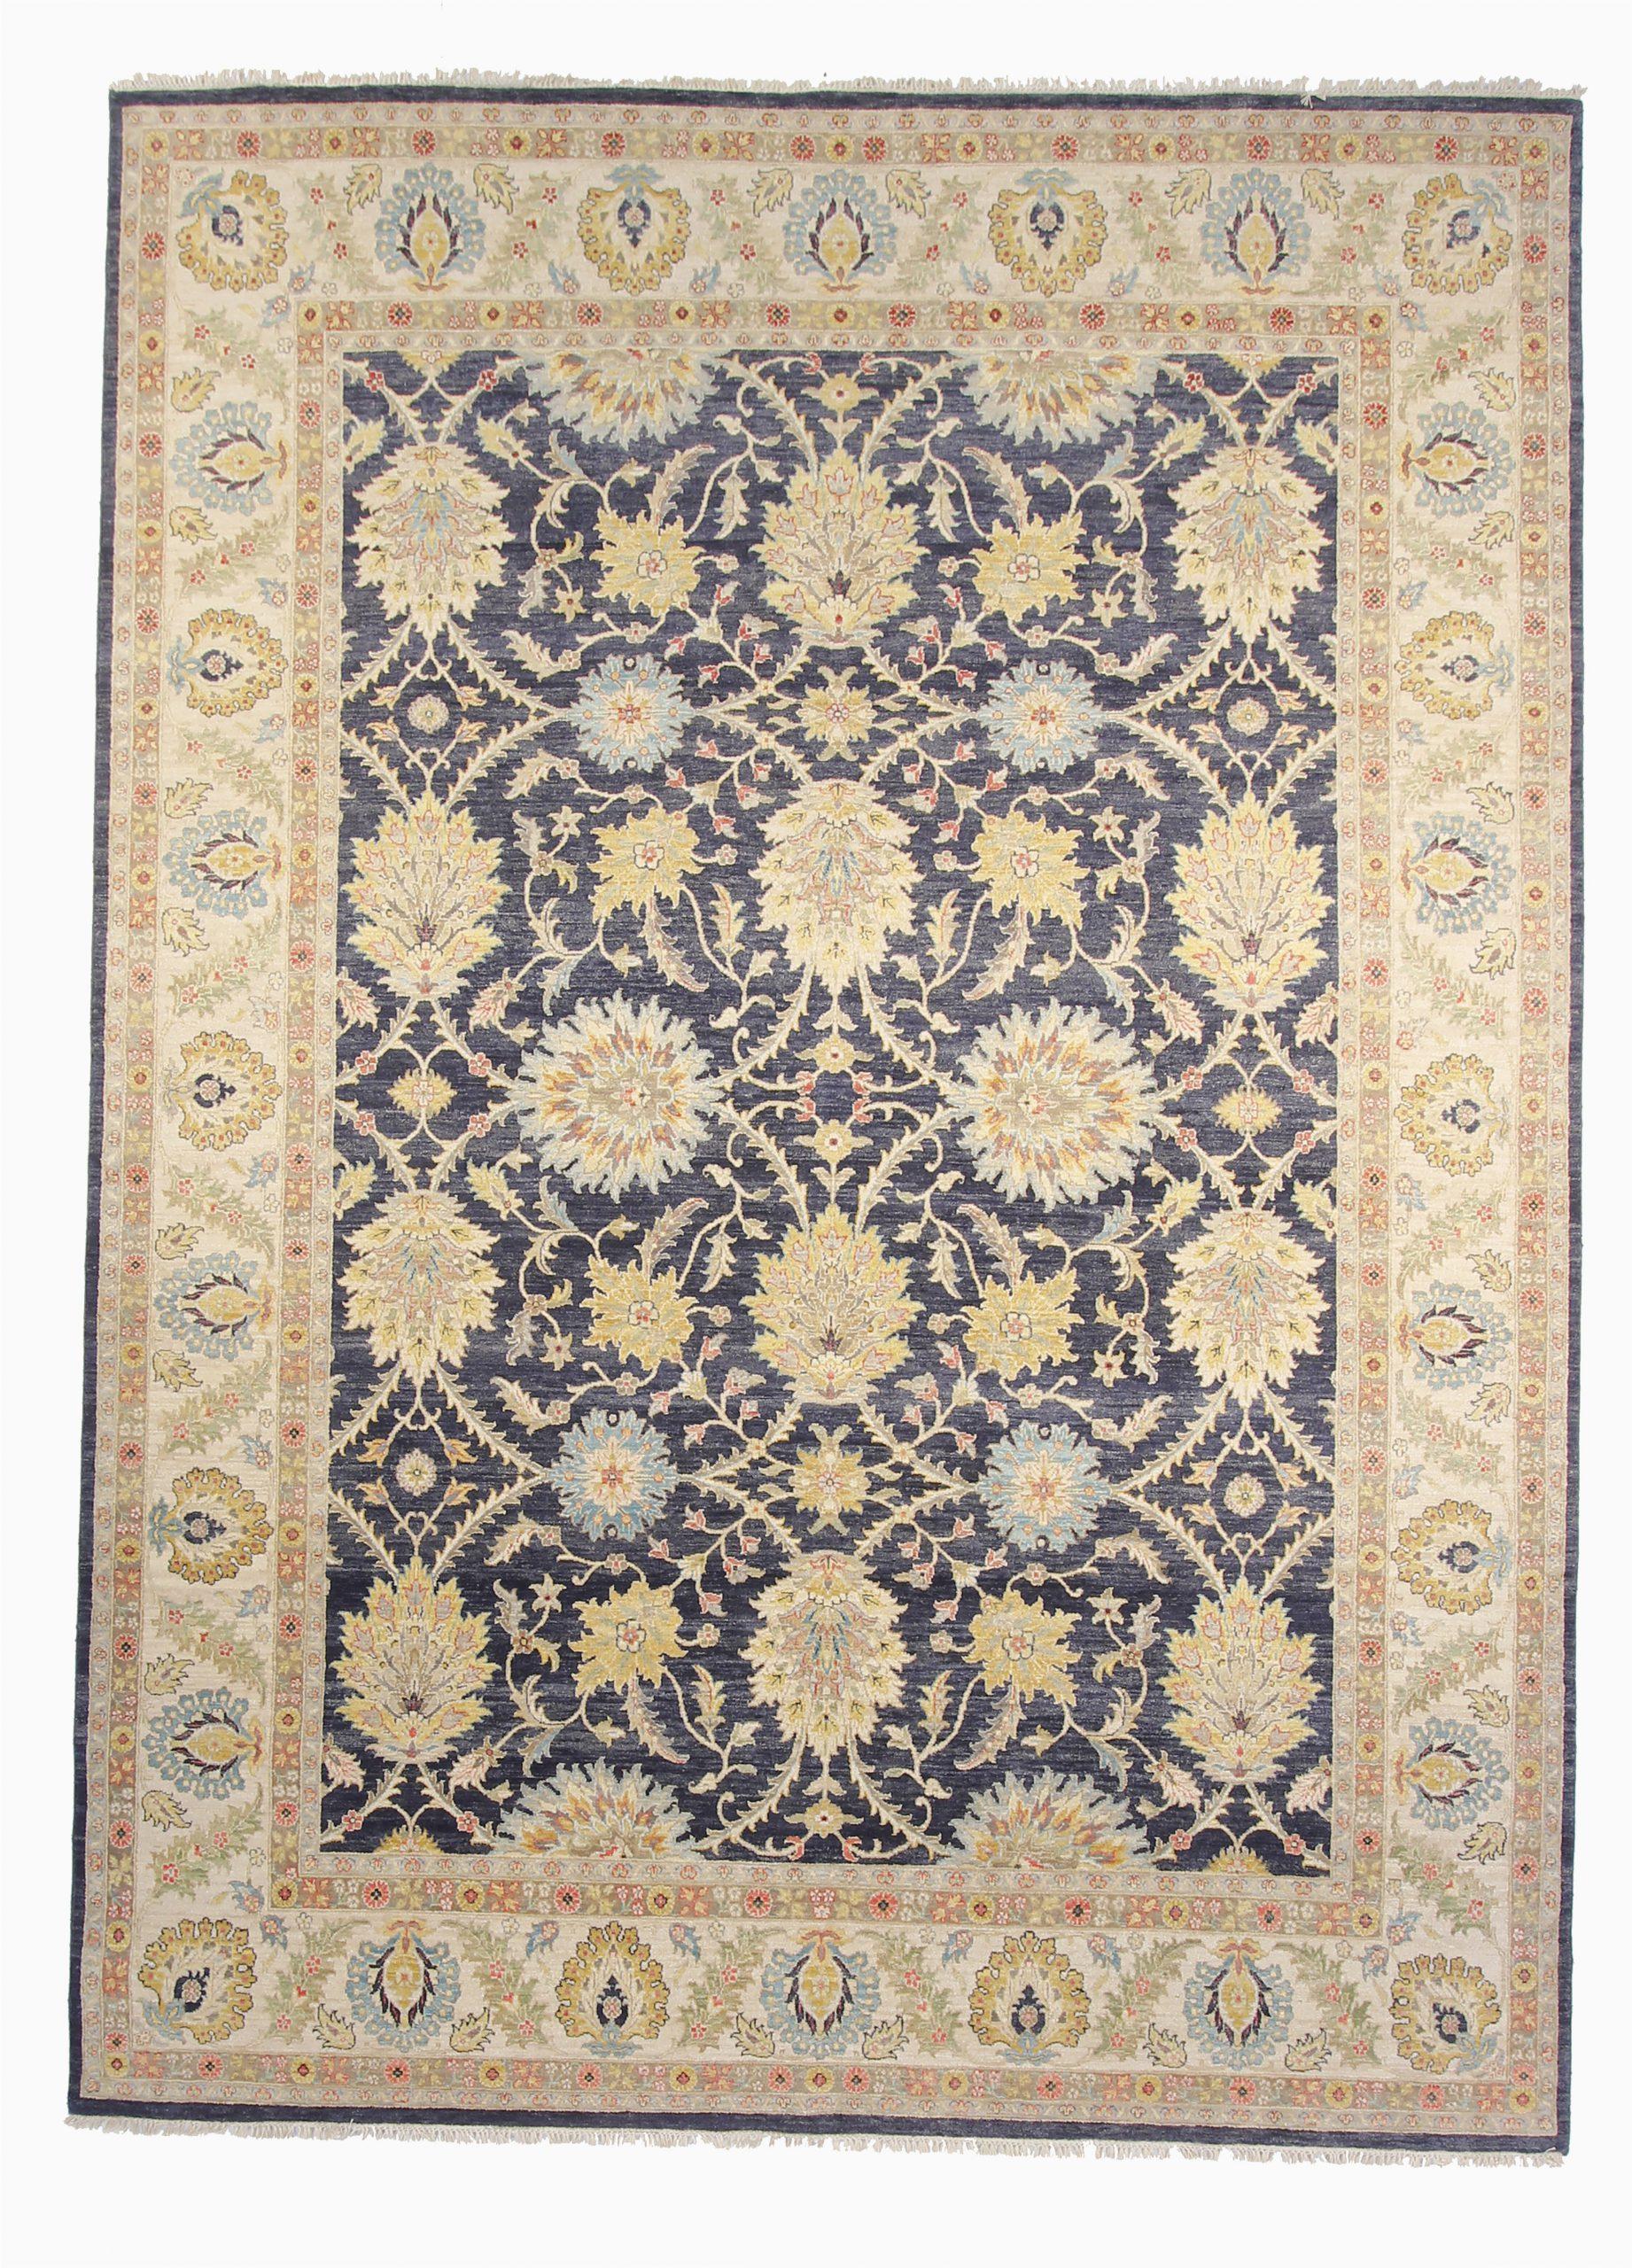 blume wool graybeige area rug